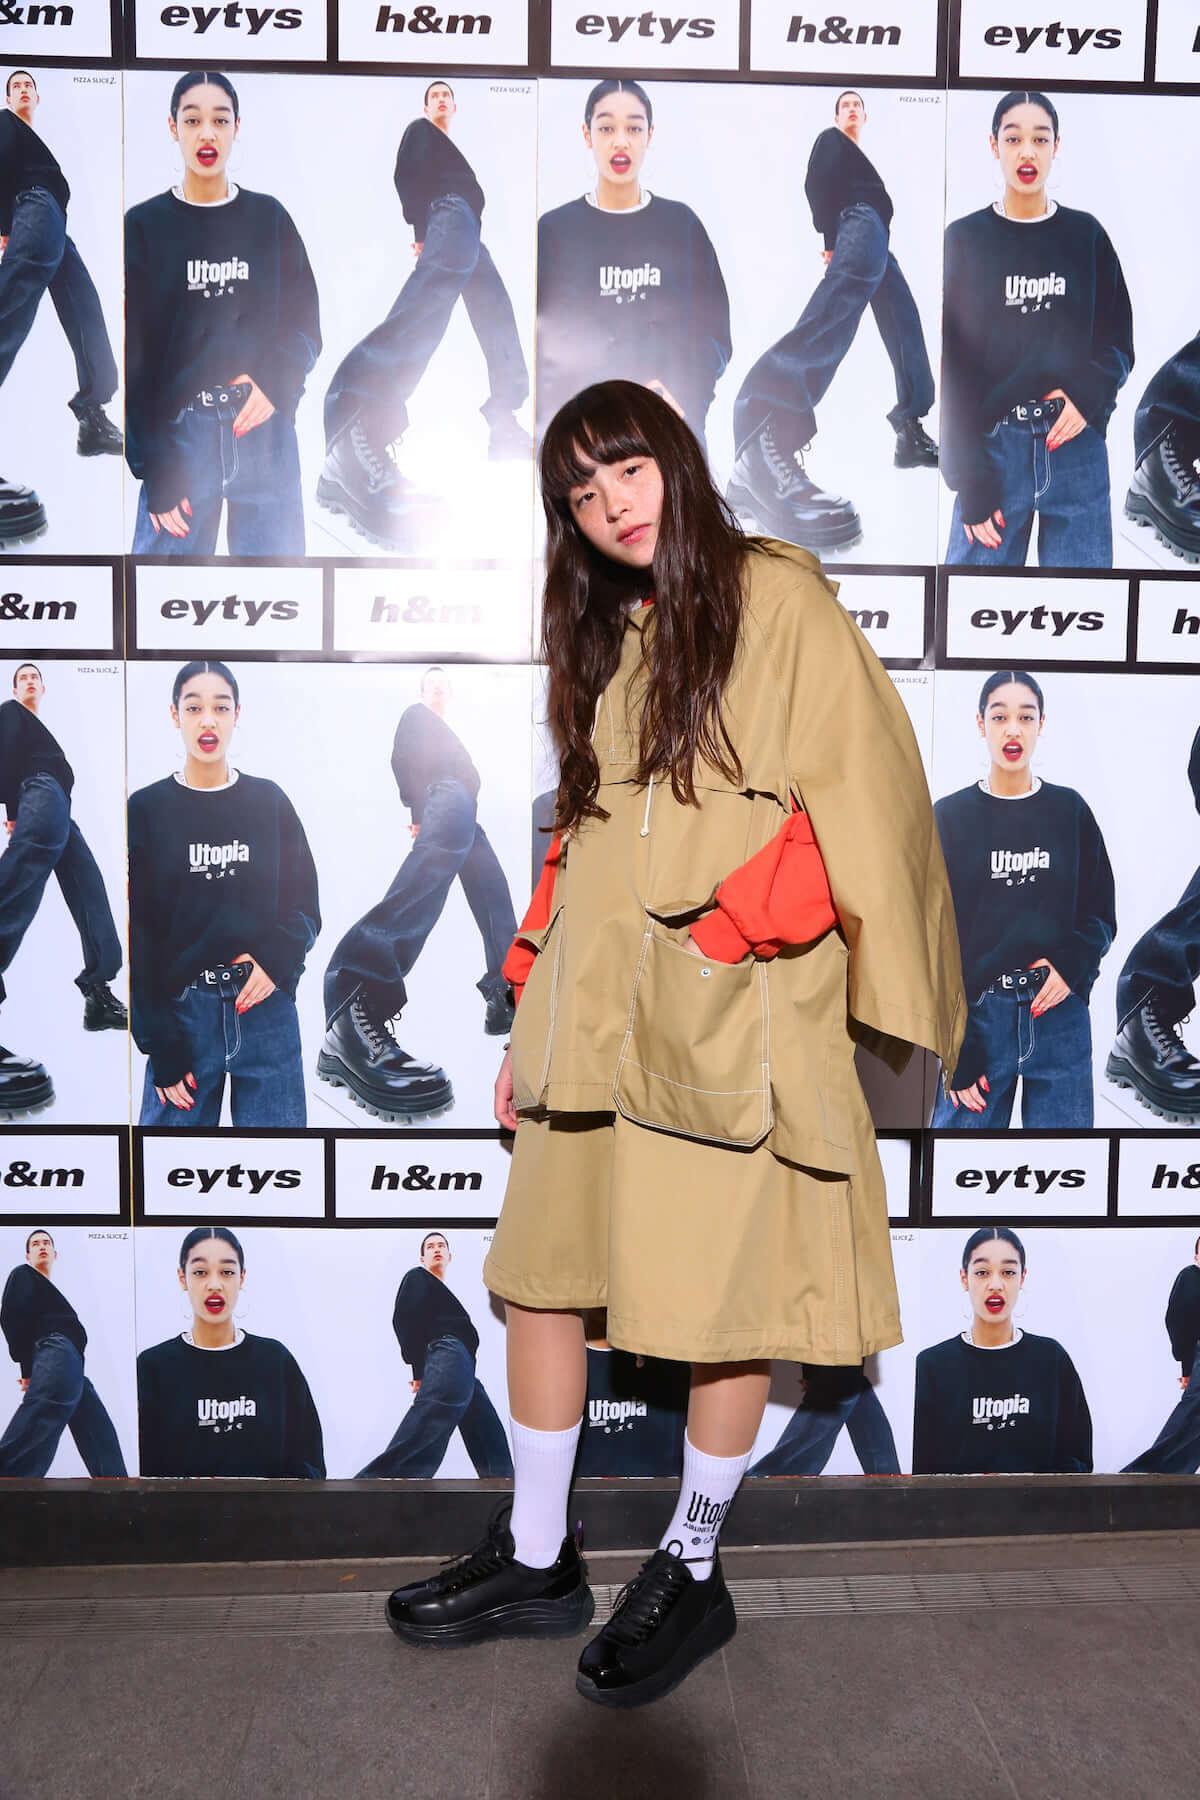 Eytys×H&Mのコラボコレクションが本日より発売開始 life-fashion190124-hm-eytys-4-1200x1800